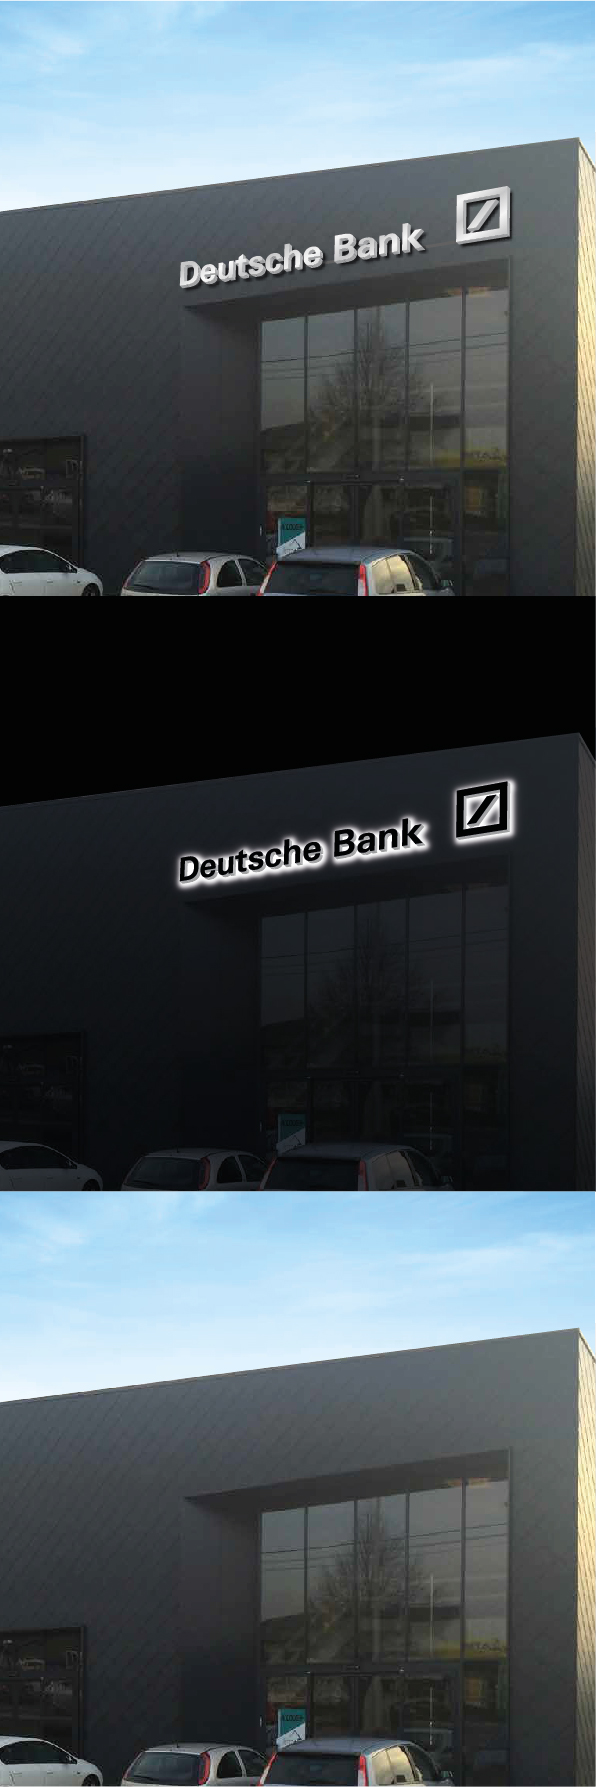 Deutsche Bank Namur 6 SO_2017_2565-01